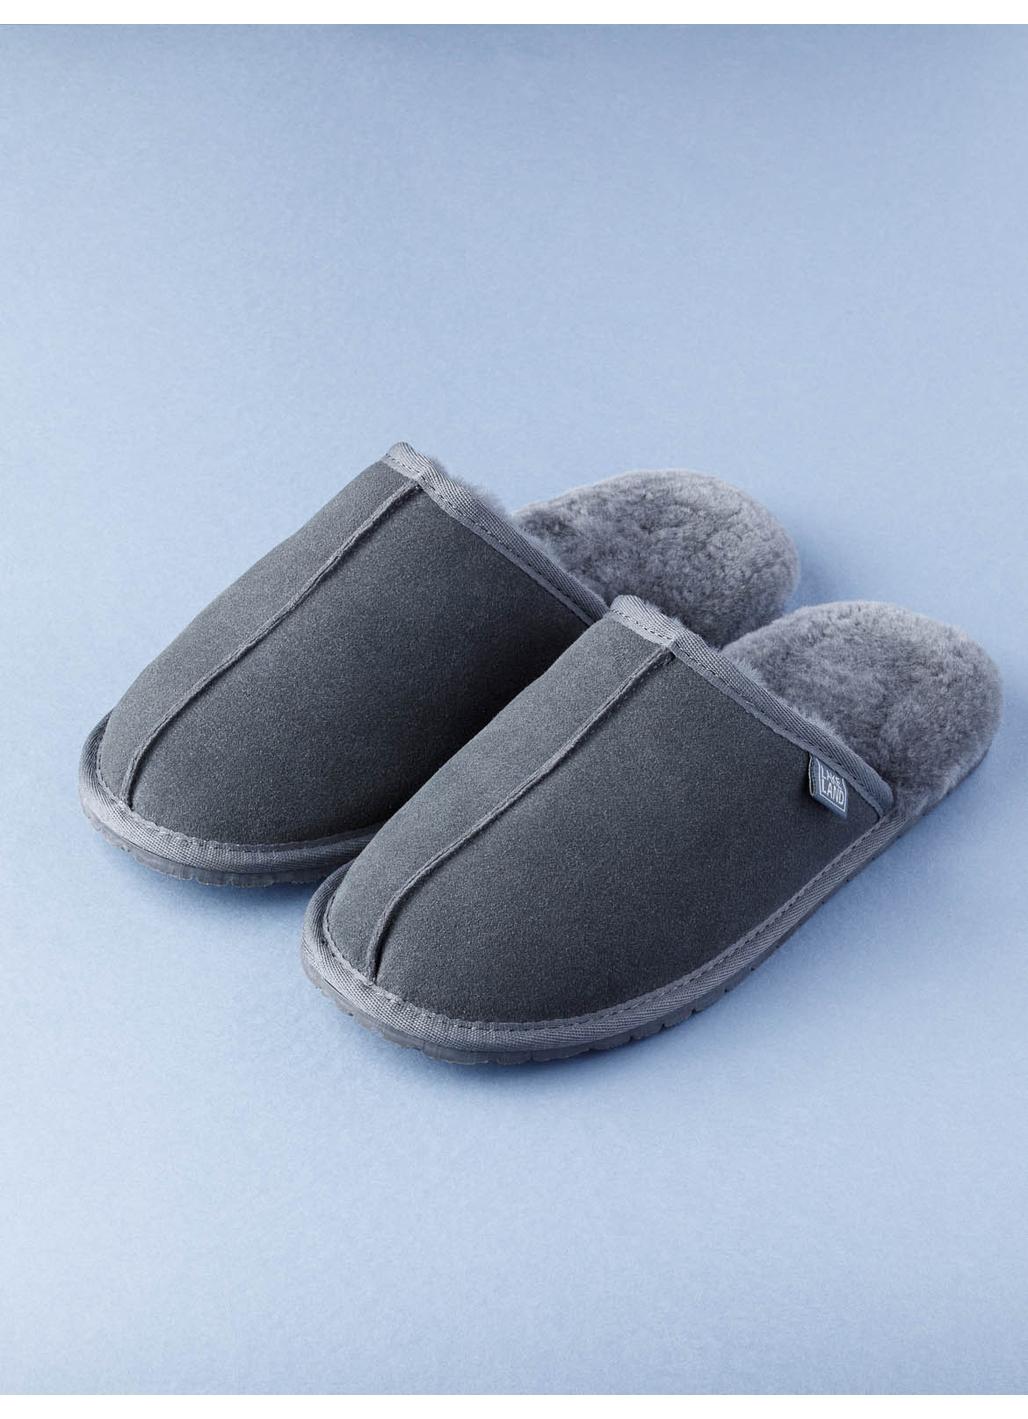 Men's Sheepskin Slider Slippers in Grey